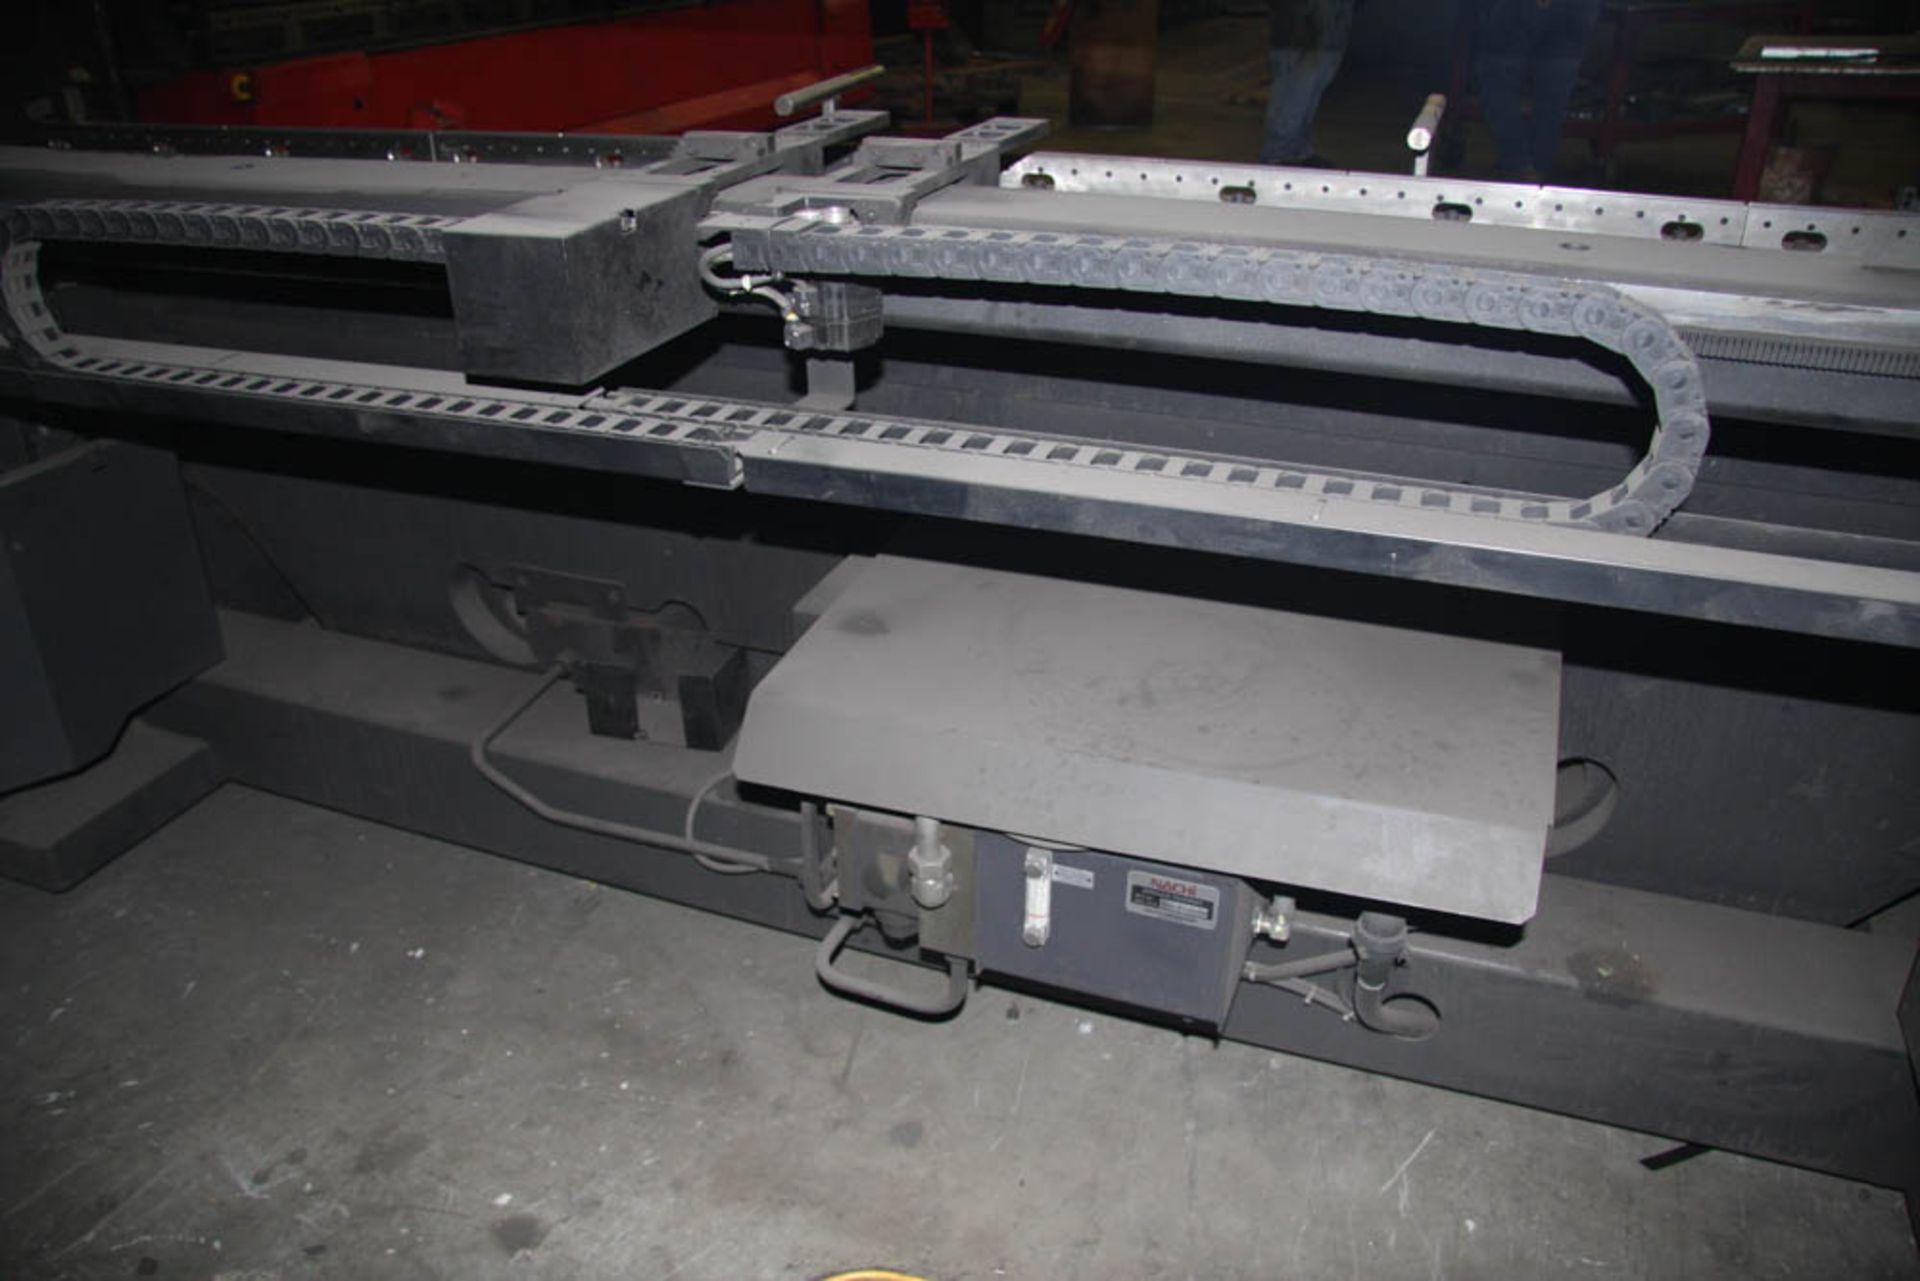 "2015 187 US TON X 122"" AMADA MDL. HG1703 CNC PRESS BRAKE, AMNC 3i CONTROL, 122"" MAX BEND LENGTH - Image 9 of 14"